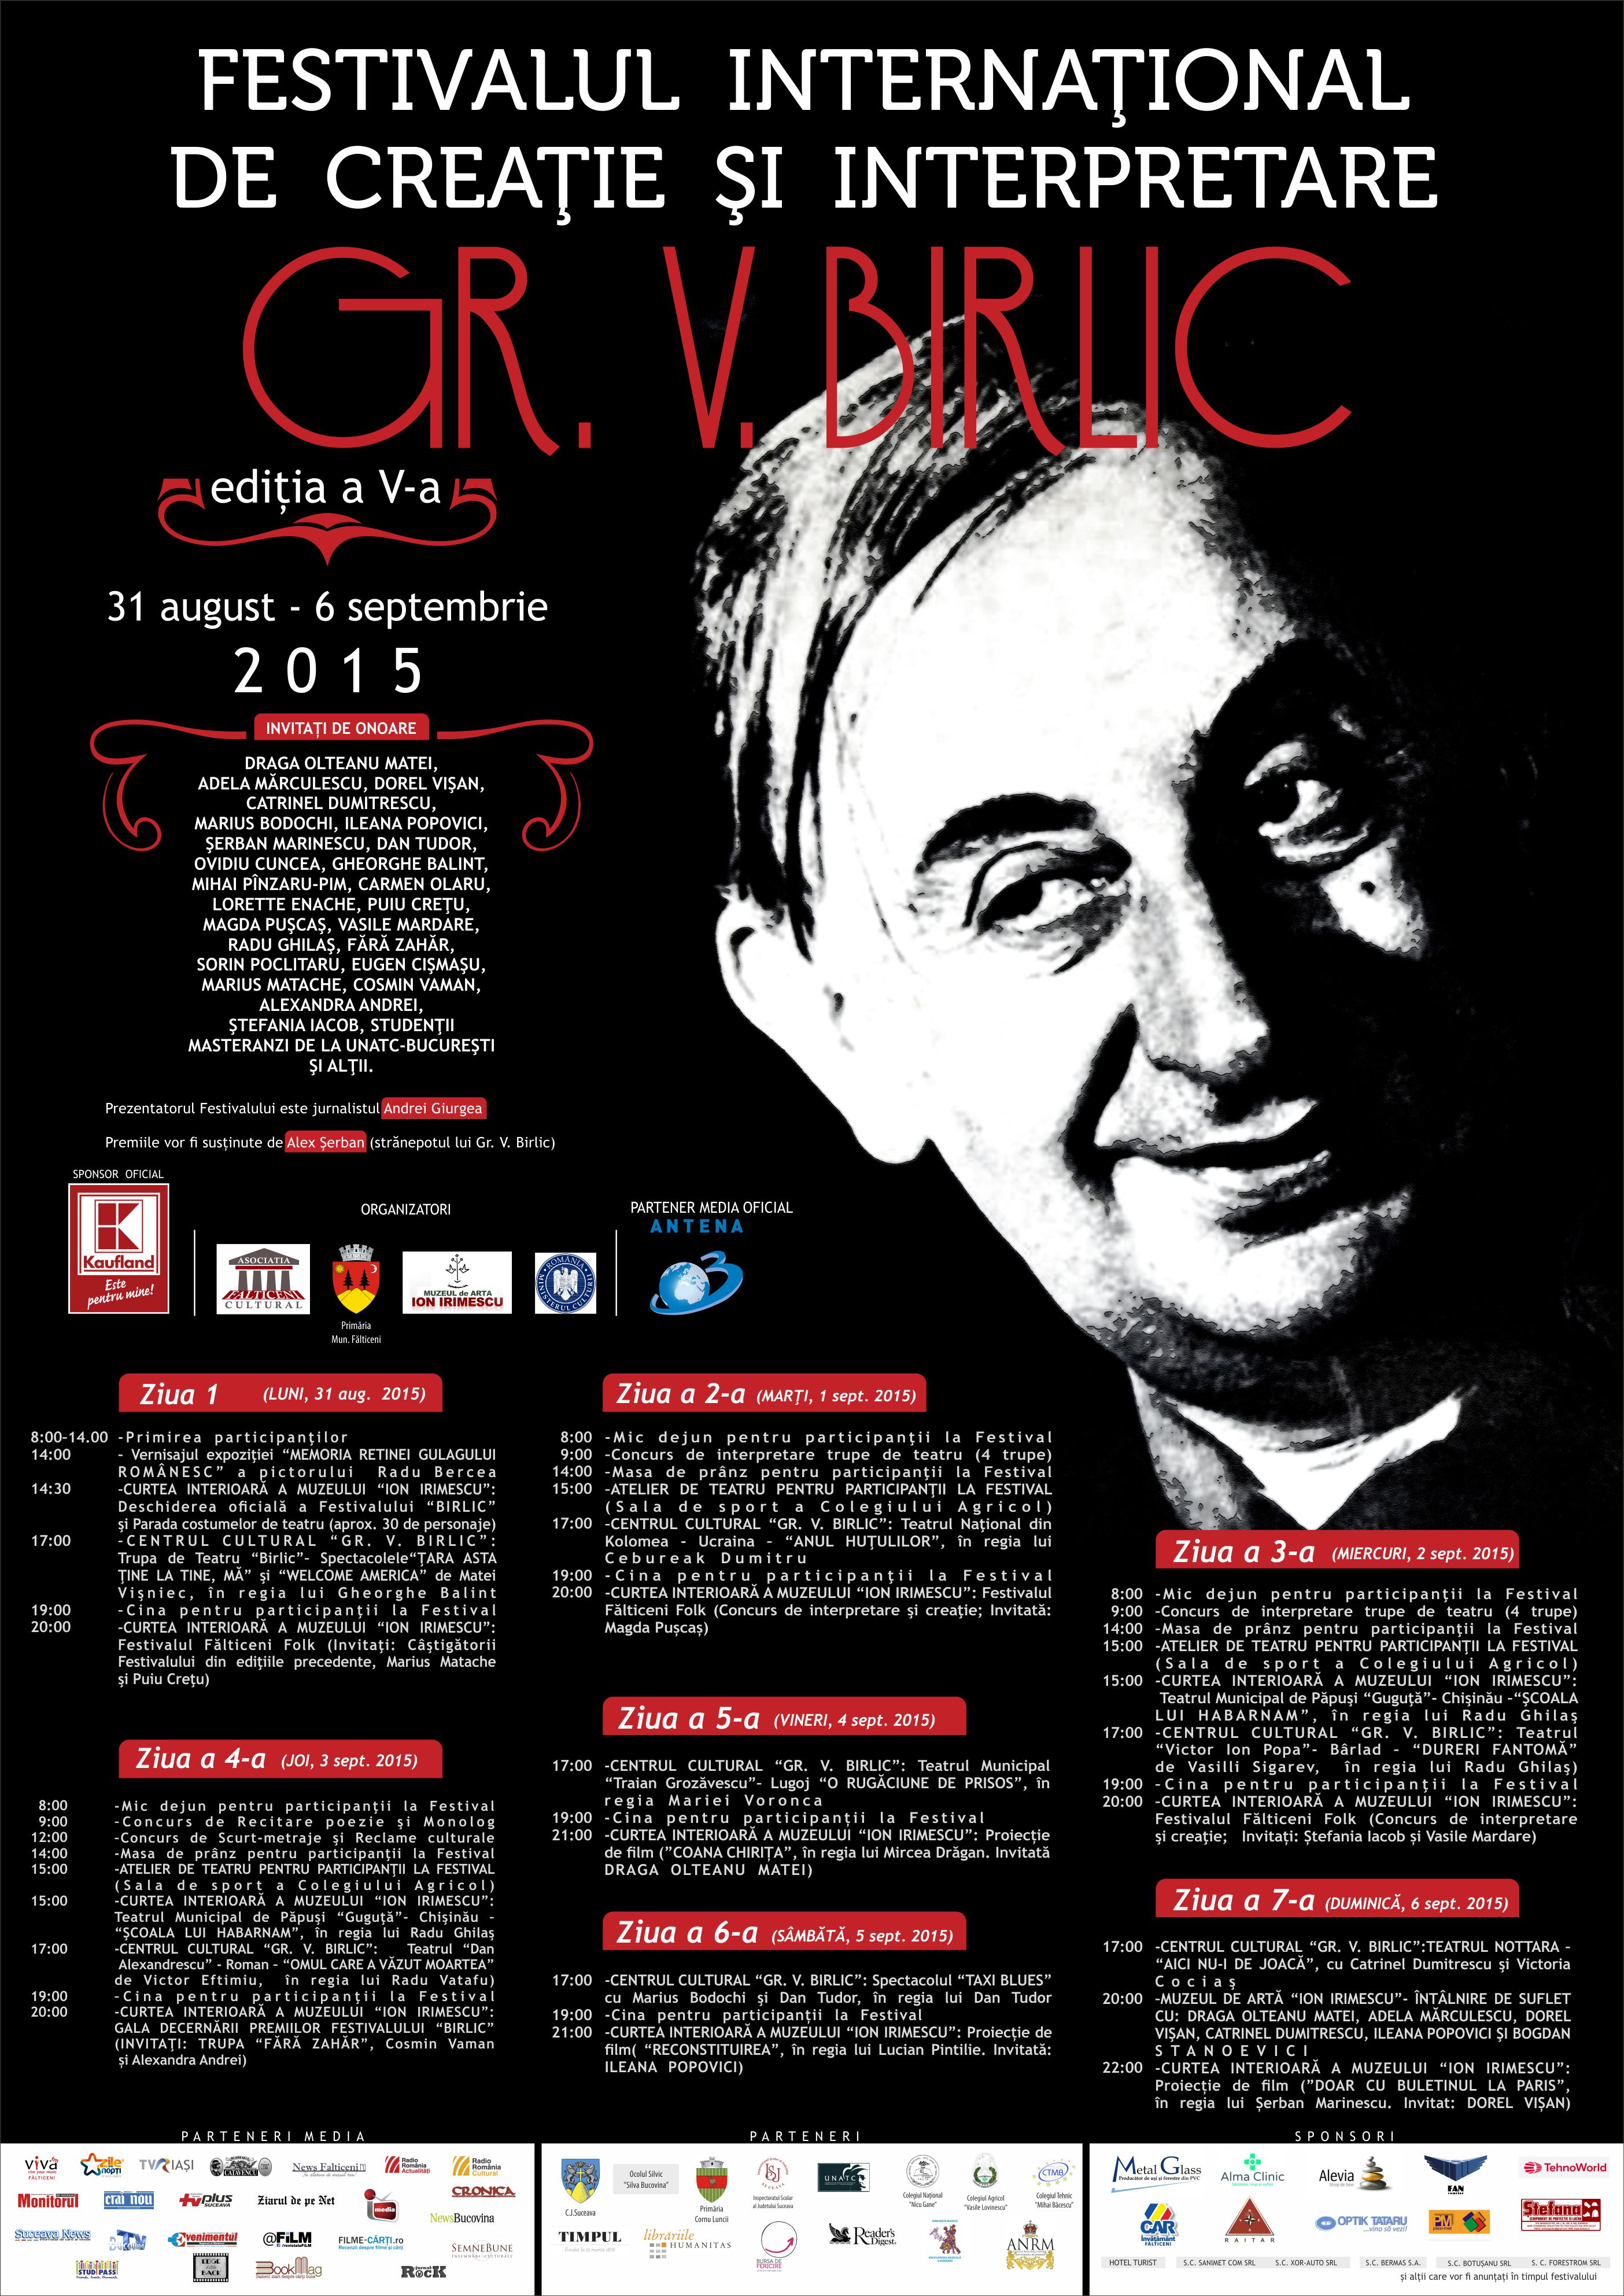 Festivalul dedicat marelui actor Gr.V. Birlic, la a V-a ediție